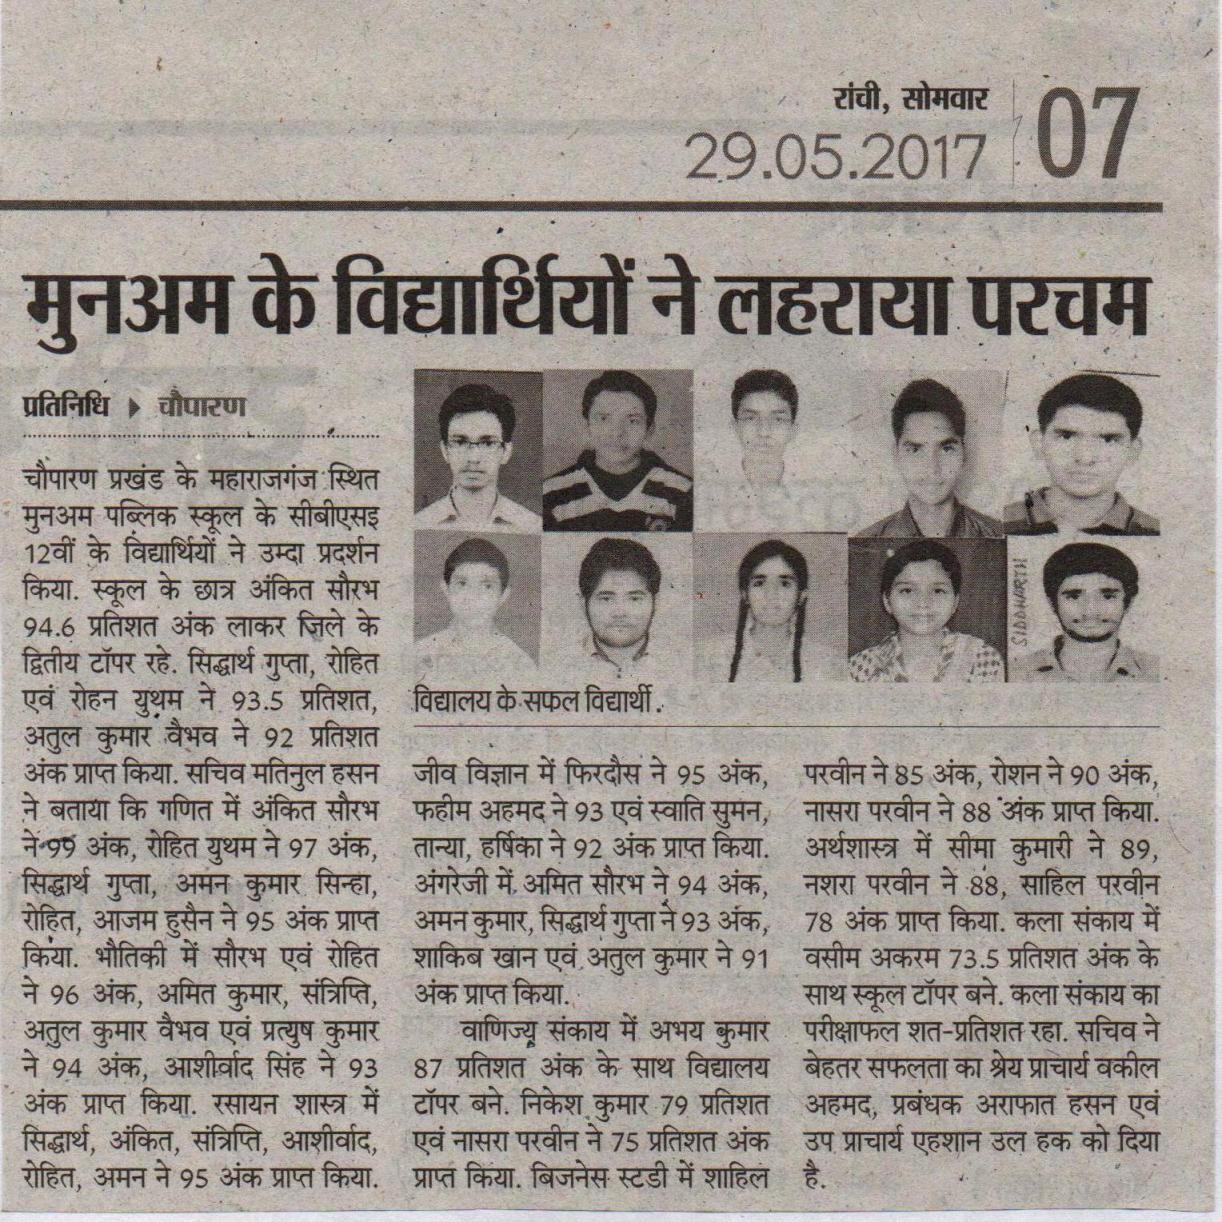 Prabhat Khabar 29-5-2017 | Munam Public School | munampublicschool.com